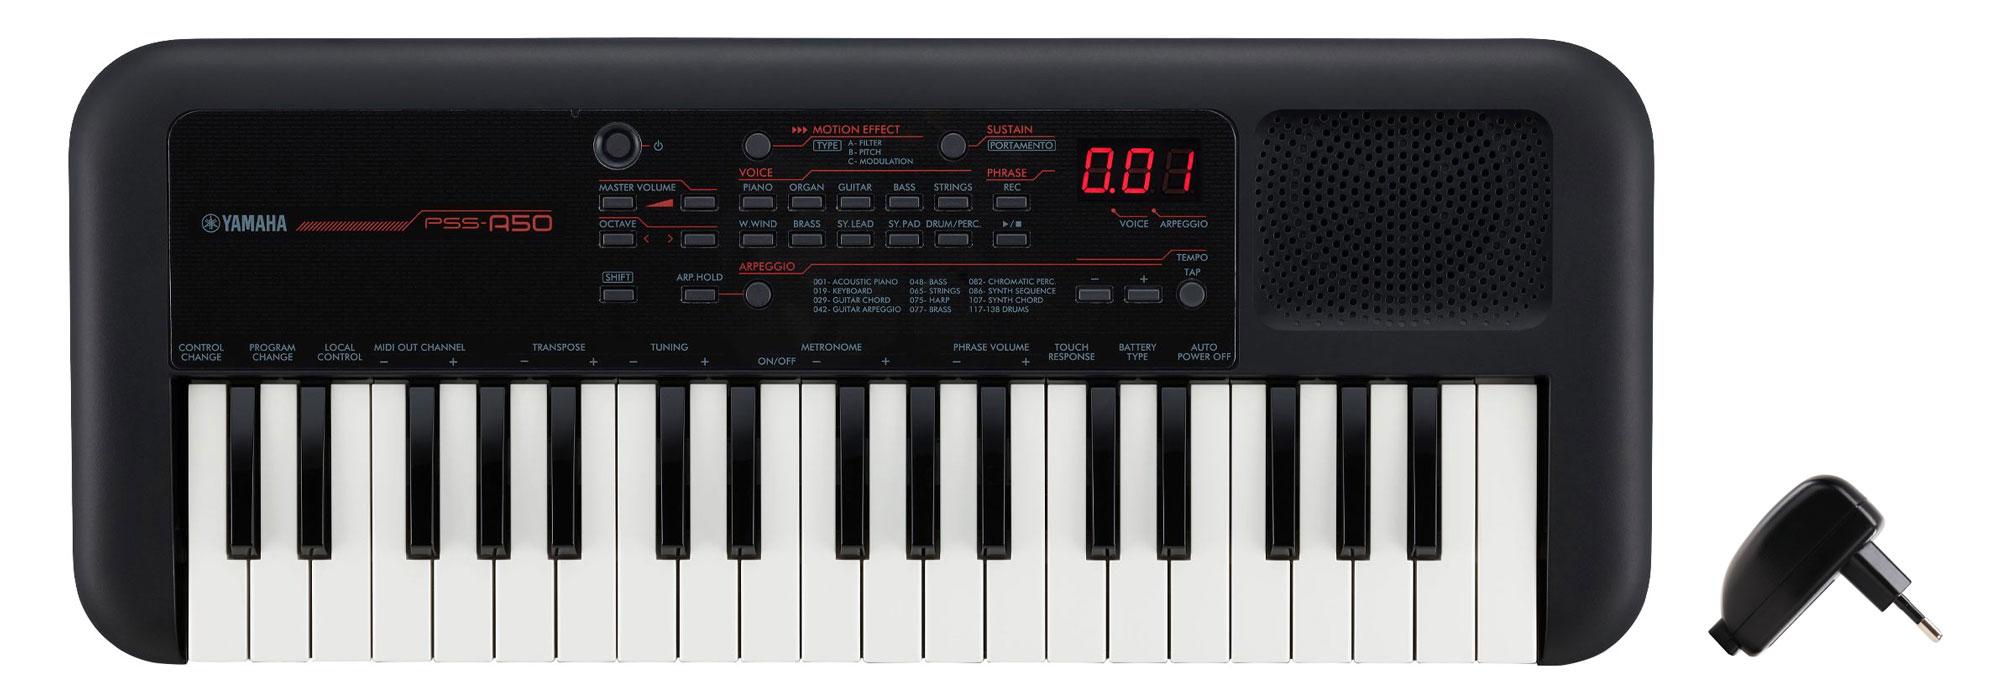 Homekeyboards - Yamaha PSS A50 Keyboard Set inkl. USB Netzteil - Onlineshop Musikhaus Kirstein